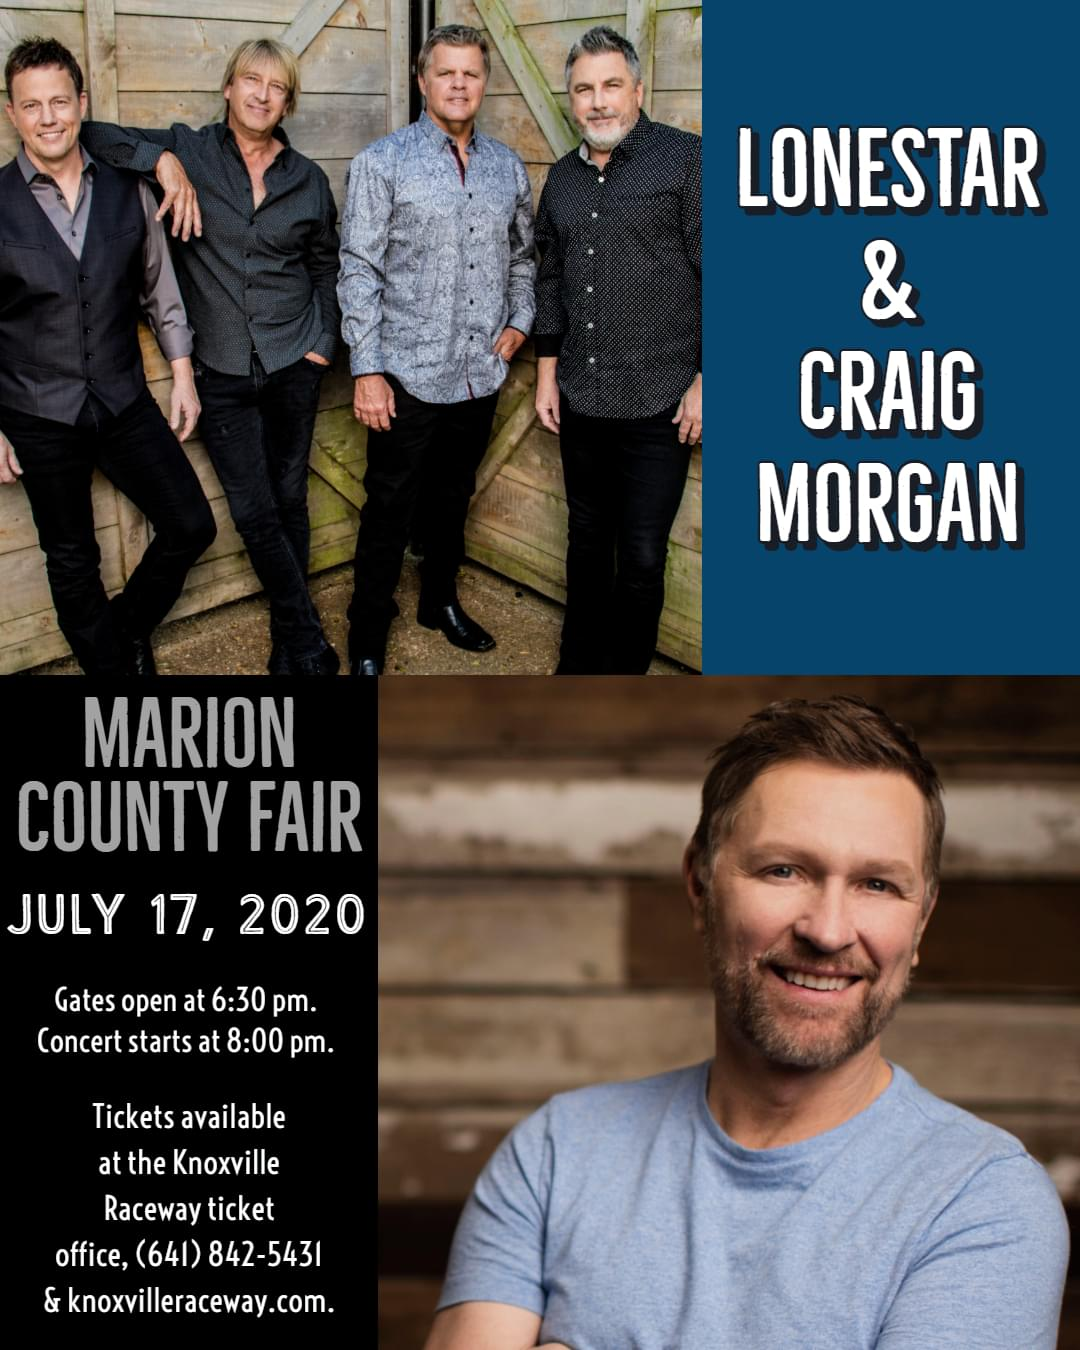 Marion County Fair Ticket Tuesday Sweet Deal